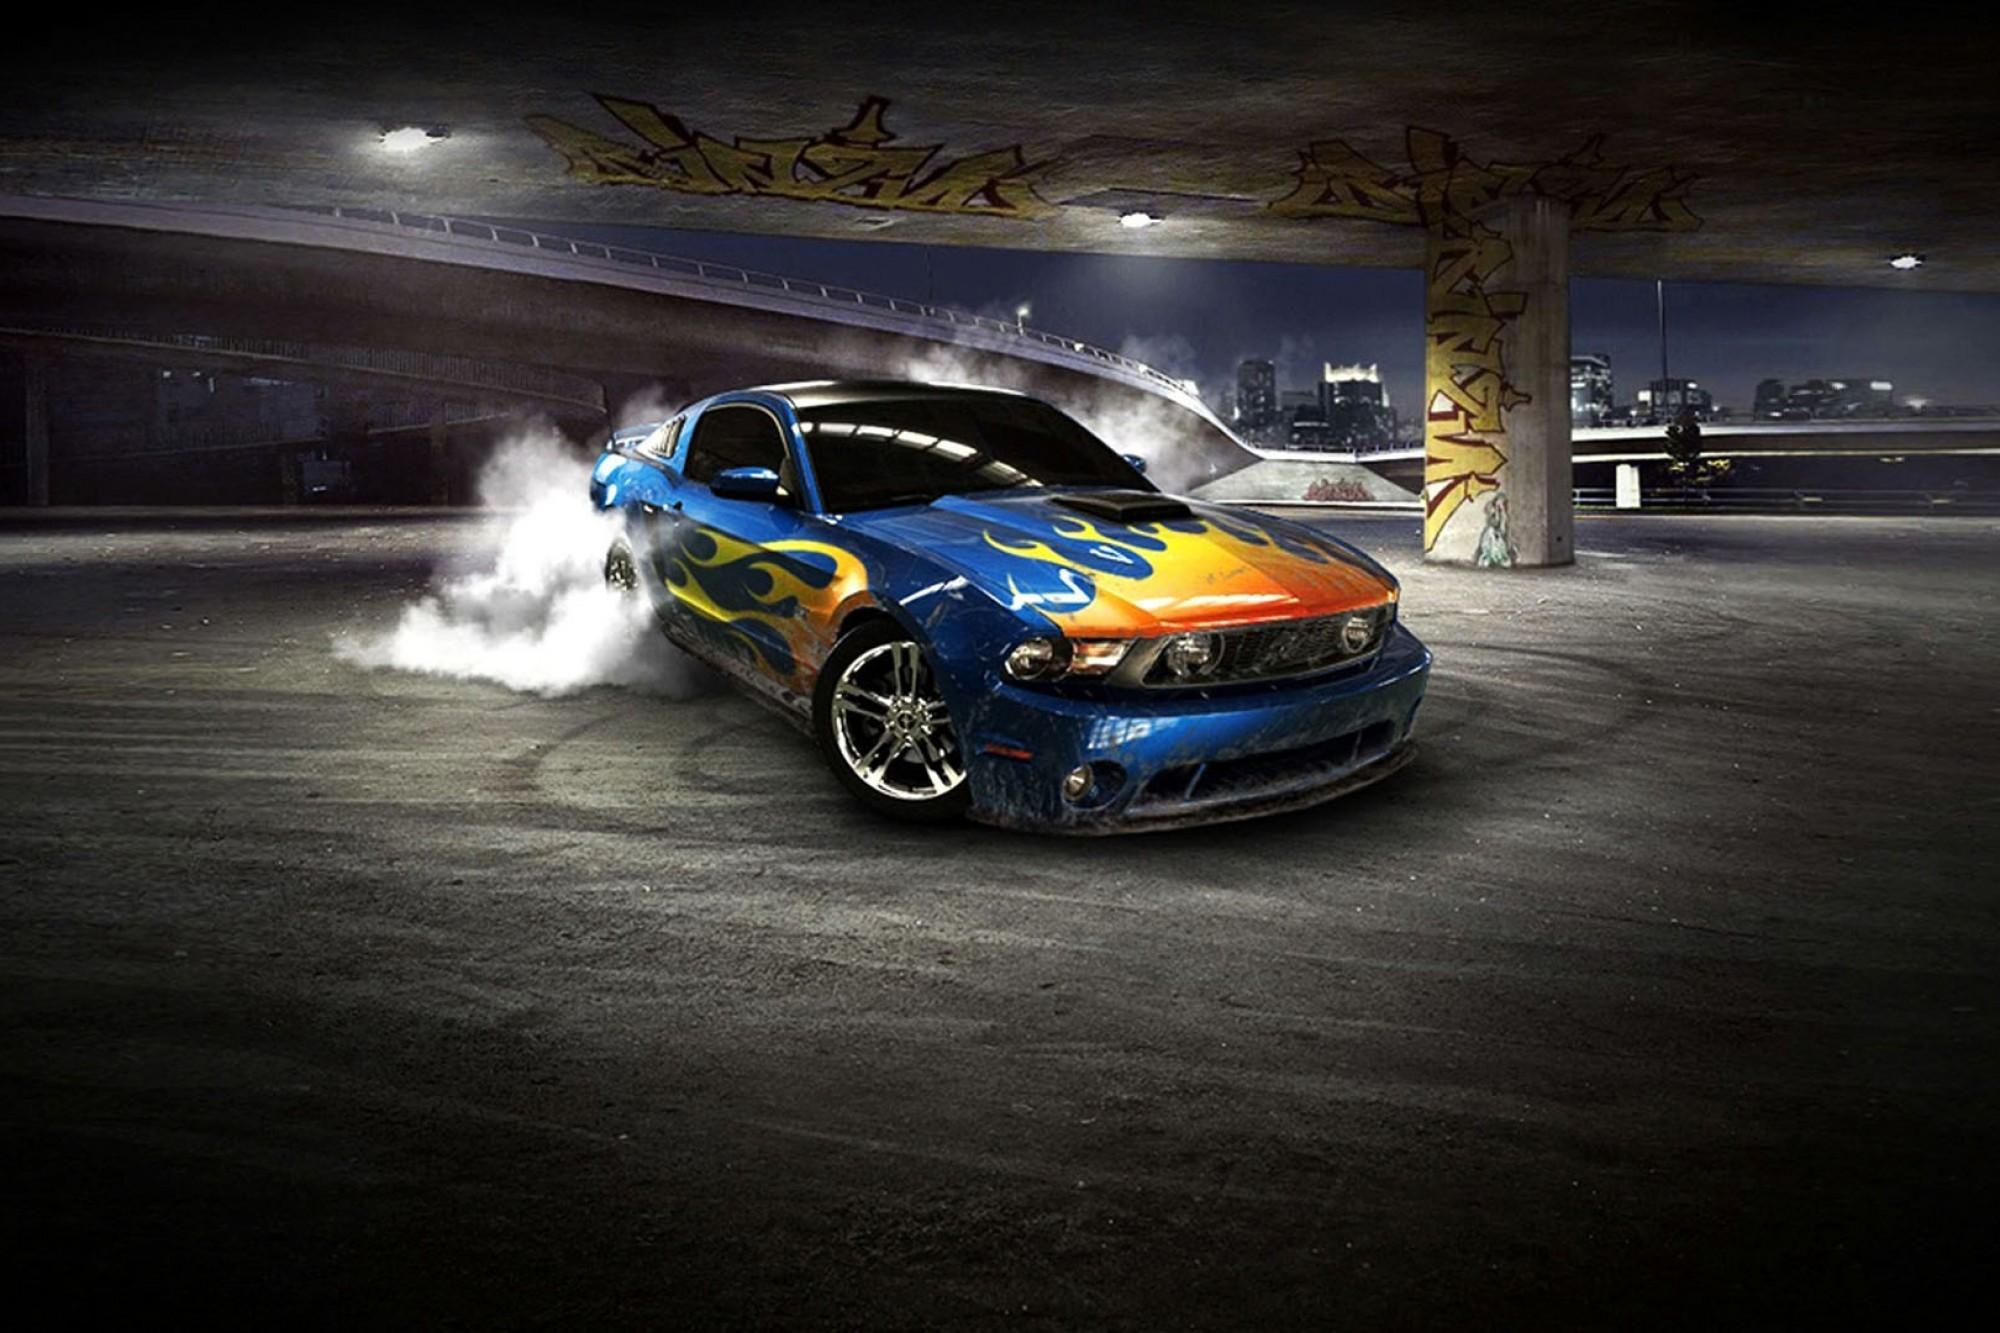 HD Race Car Wallpaper  71 images